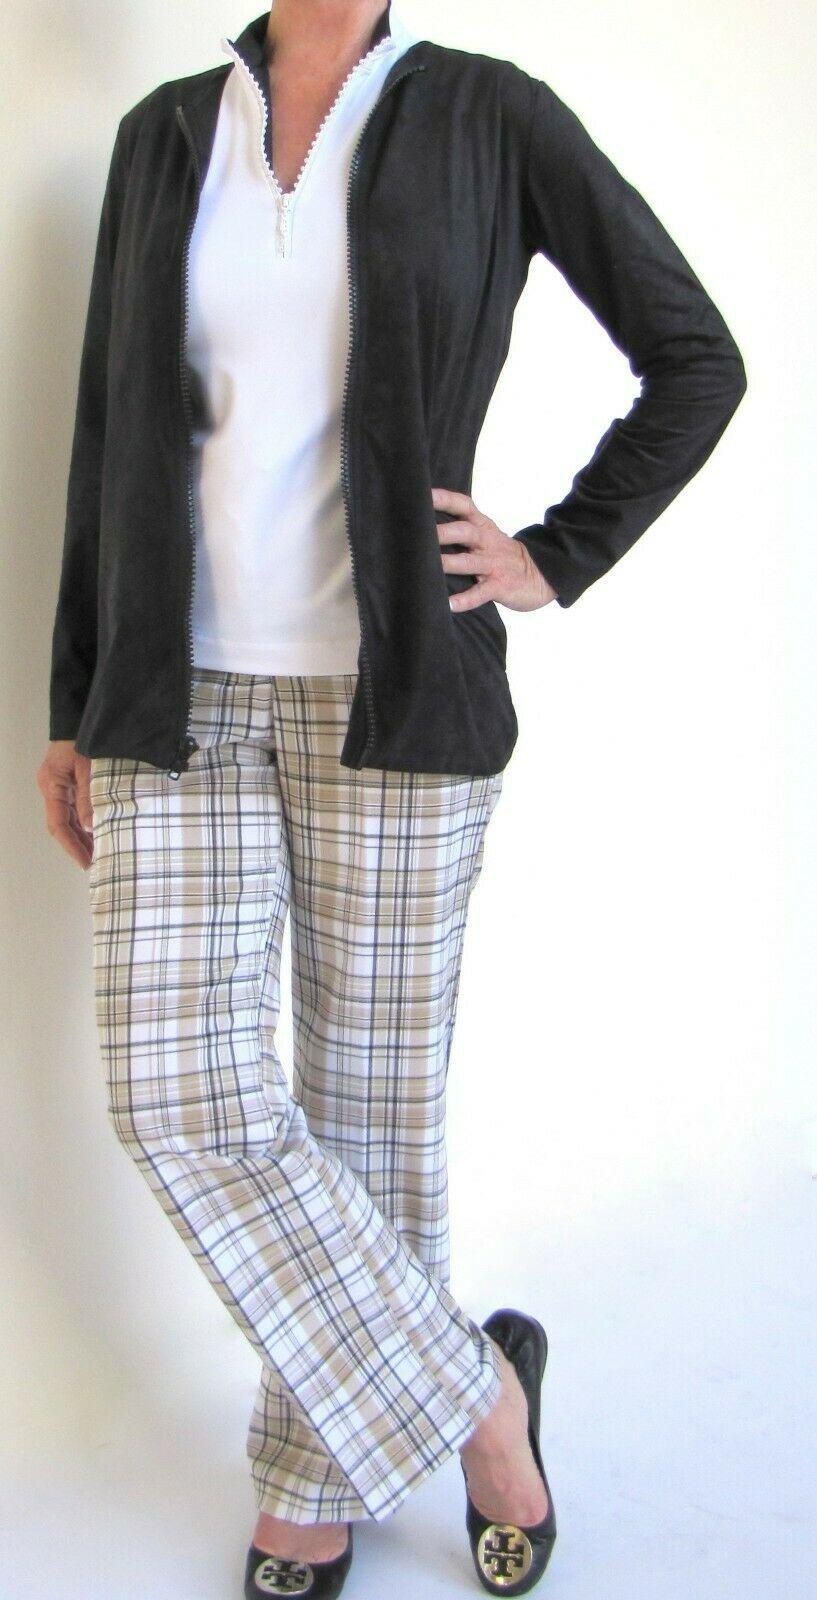 Stylish Women's Golf & Resort Black Long Sleeve Collar Top, Swarovski Buttons  image 7